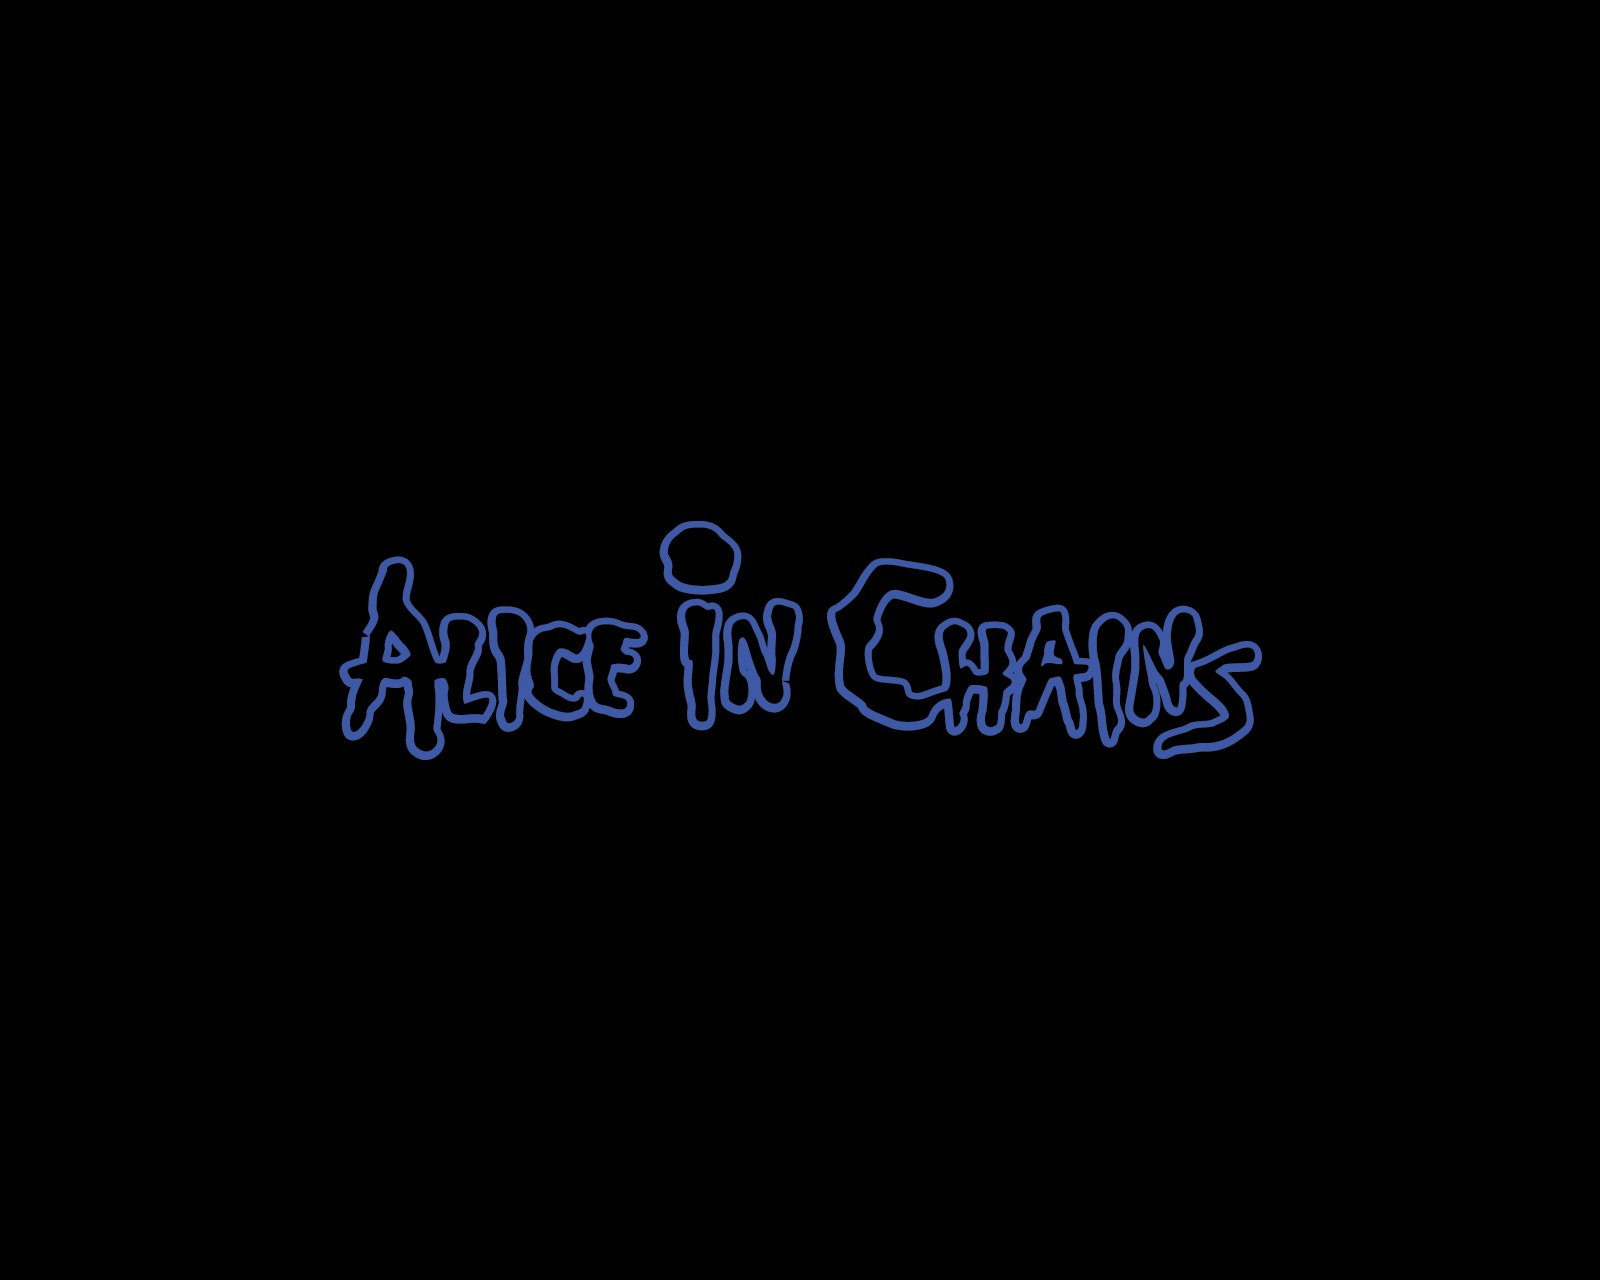 Alice In Chains Computer Wallpapers  Desktop Backgrounds